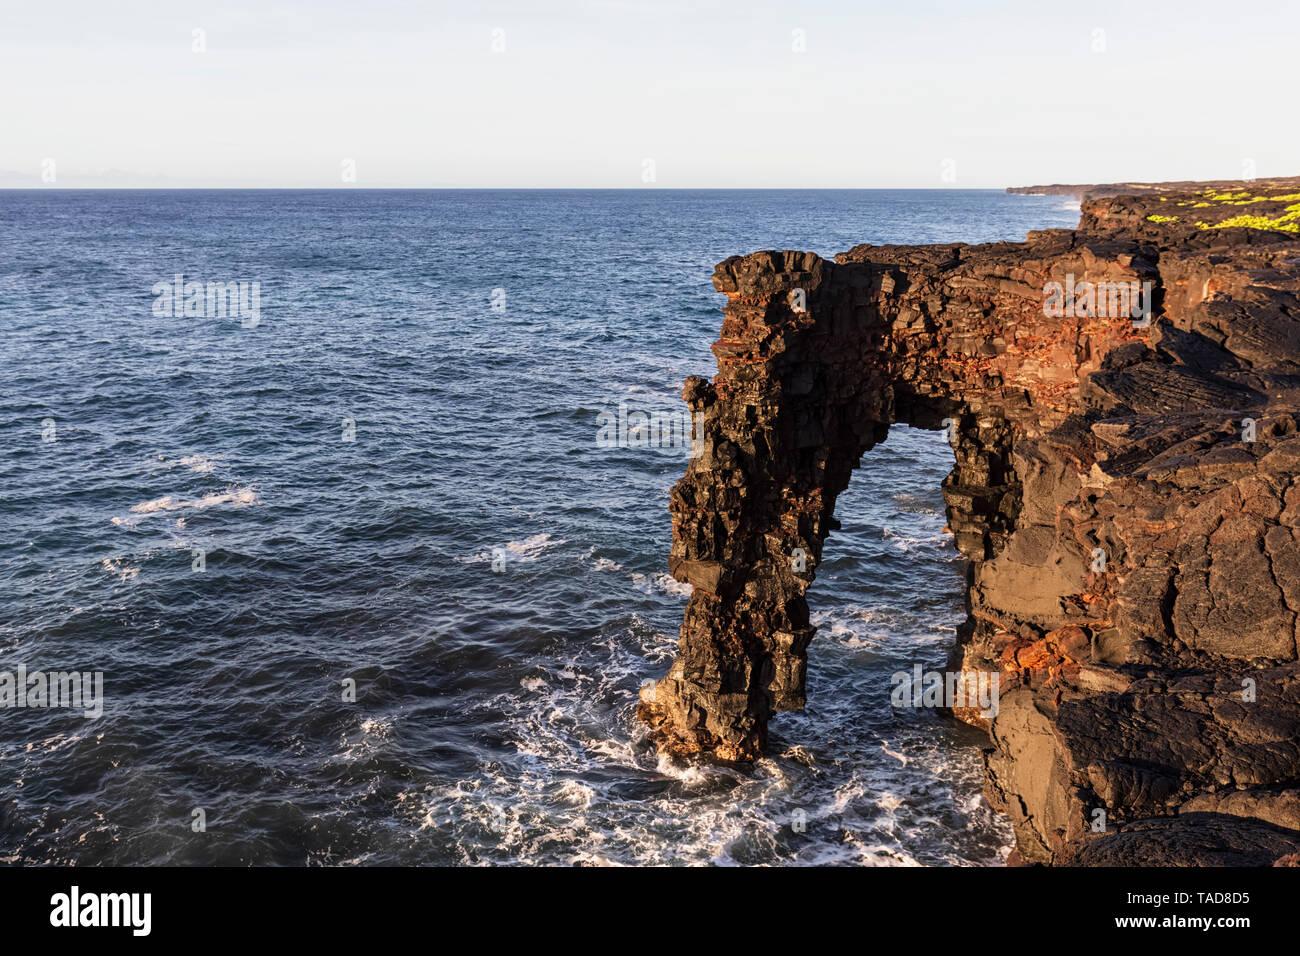 USA, Hawaii, Big Island, Volcanoes National Park, Pacific Ocean, Holei Sea Arch Stock Photo